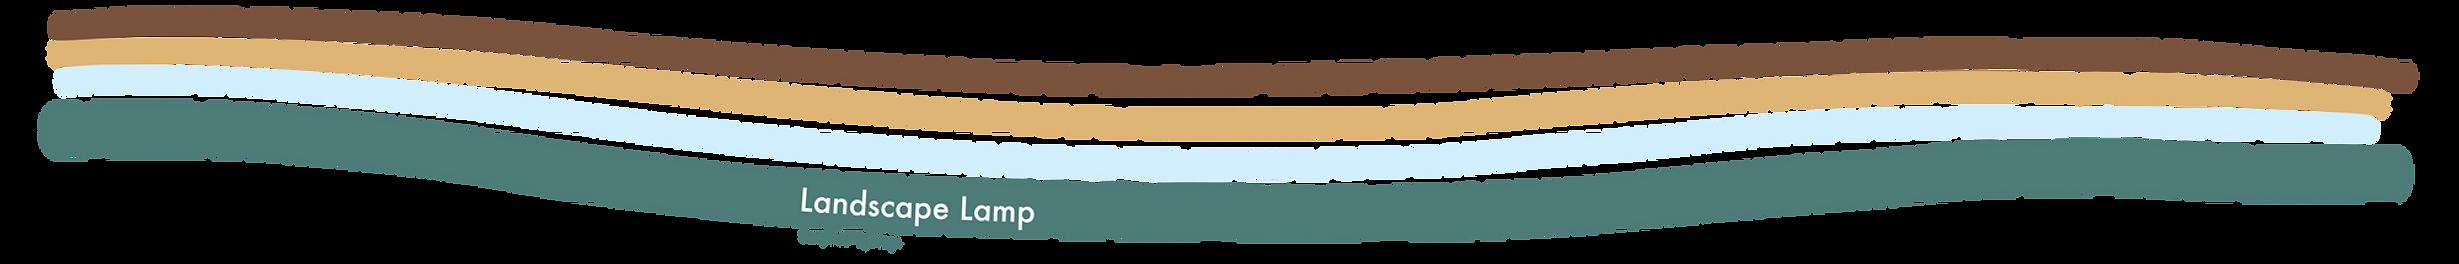 Graphisme lignes-Landscape Lamp 01-01.pn